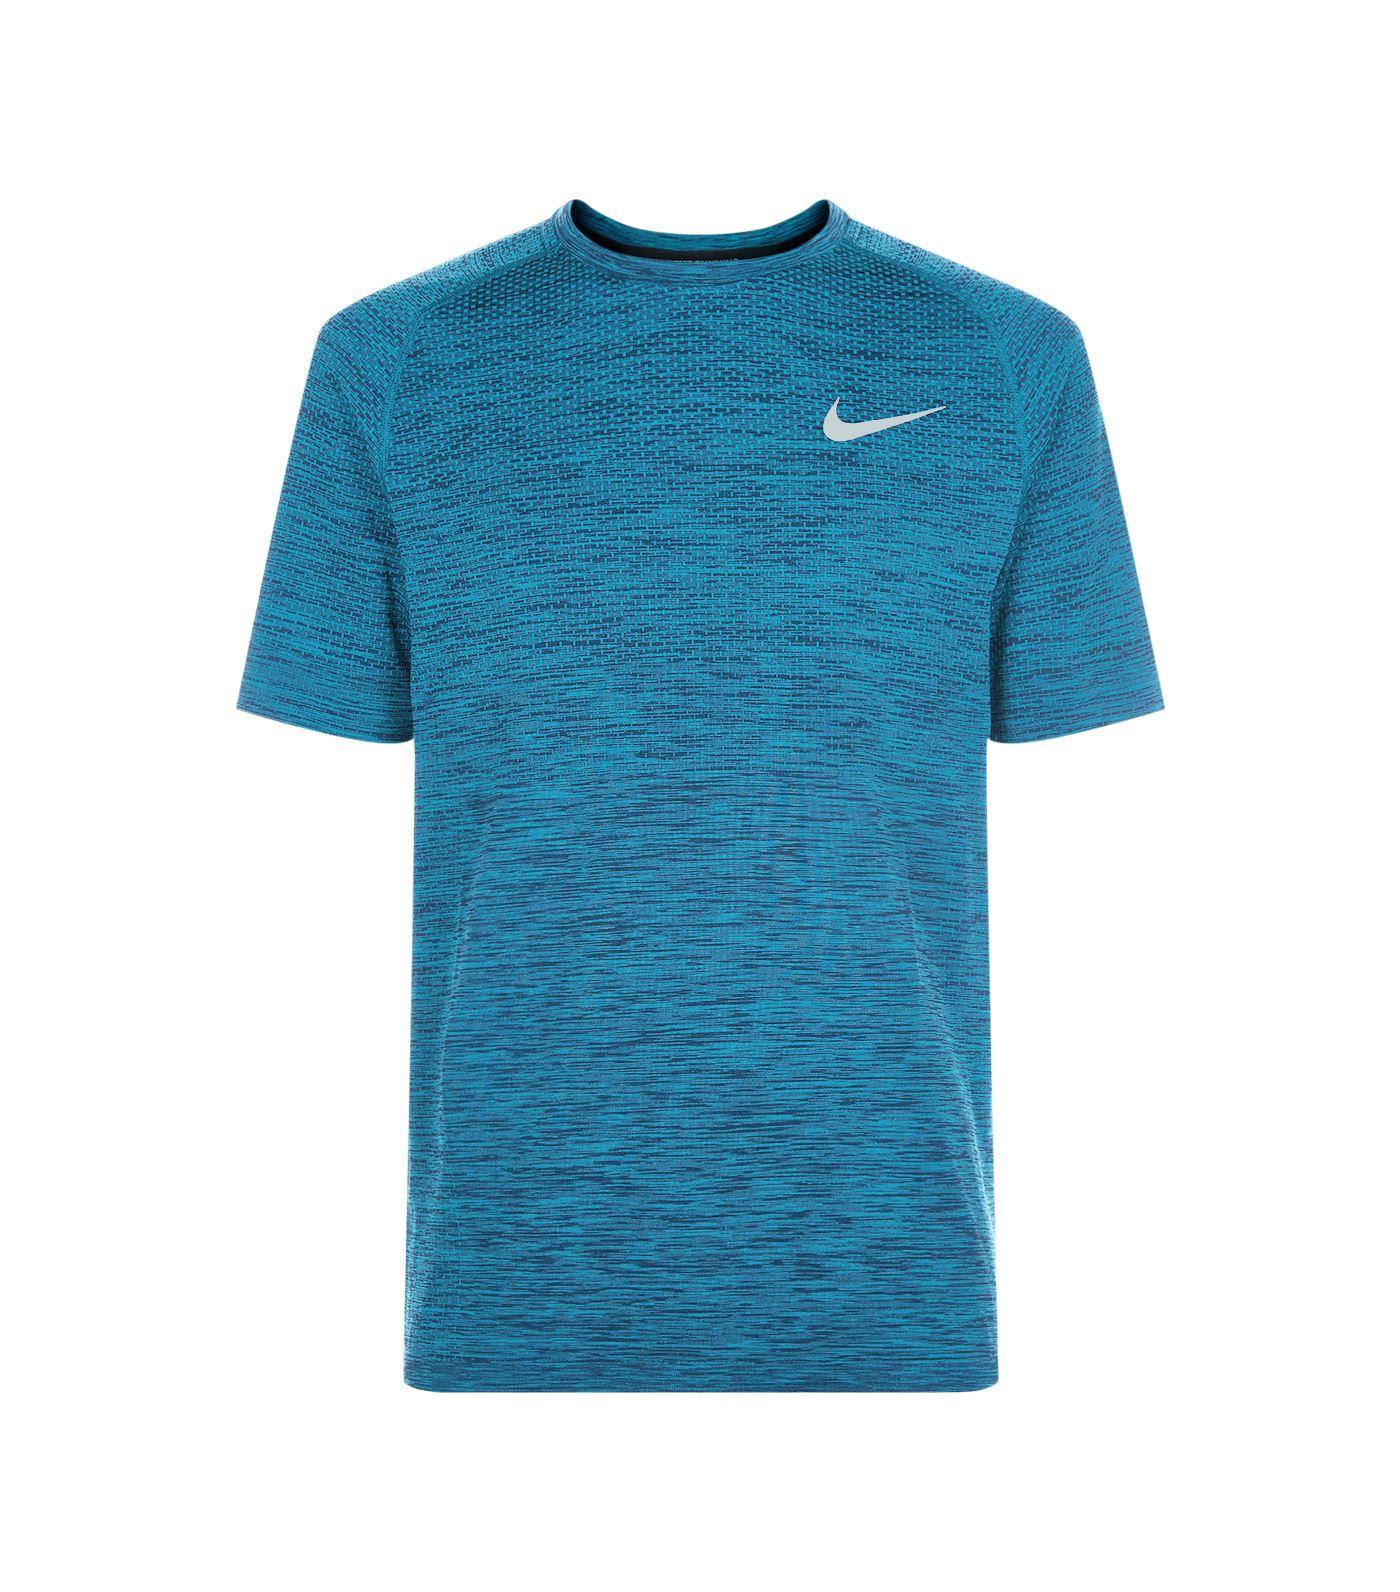 caaae6ee8588b Nike Men. NIKE. Men's Dri-Fit Seamless Running T-Shirt in No Color